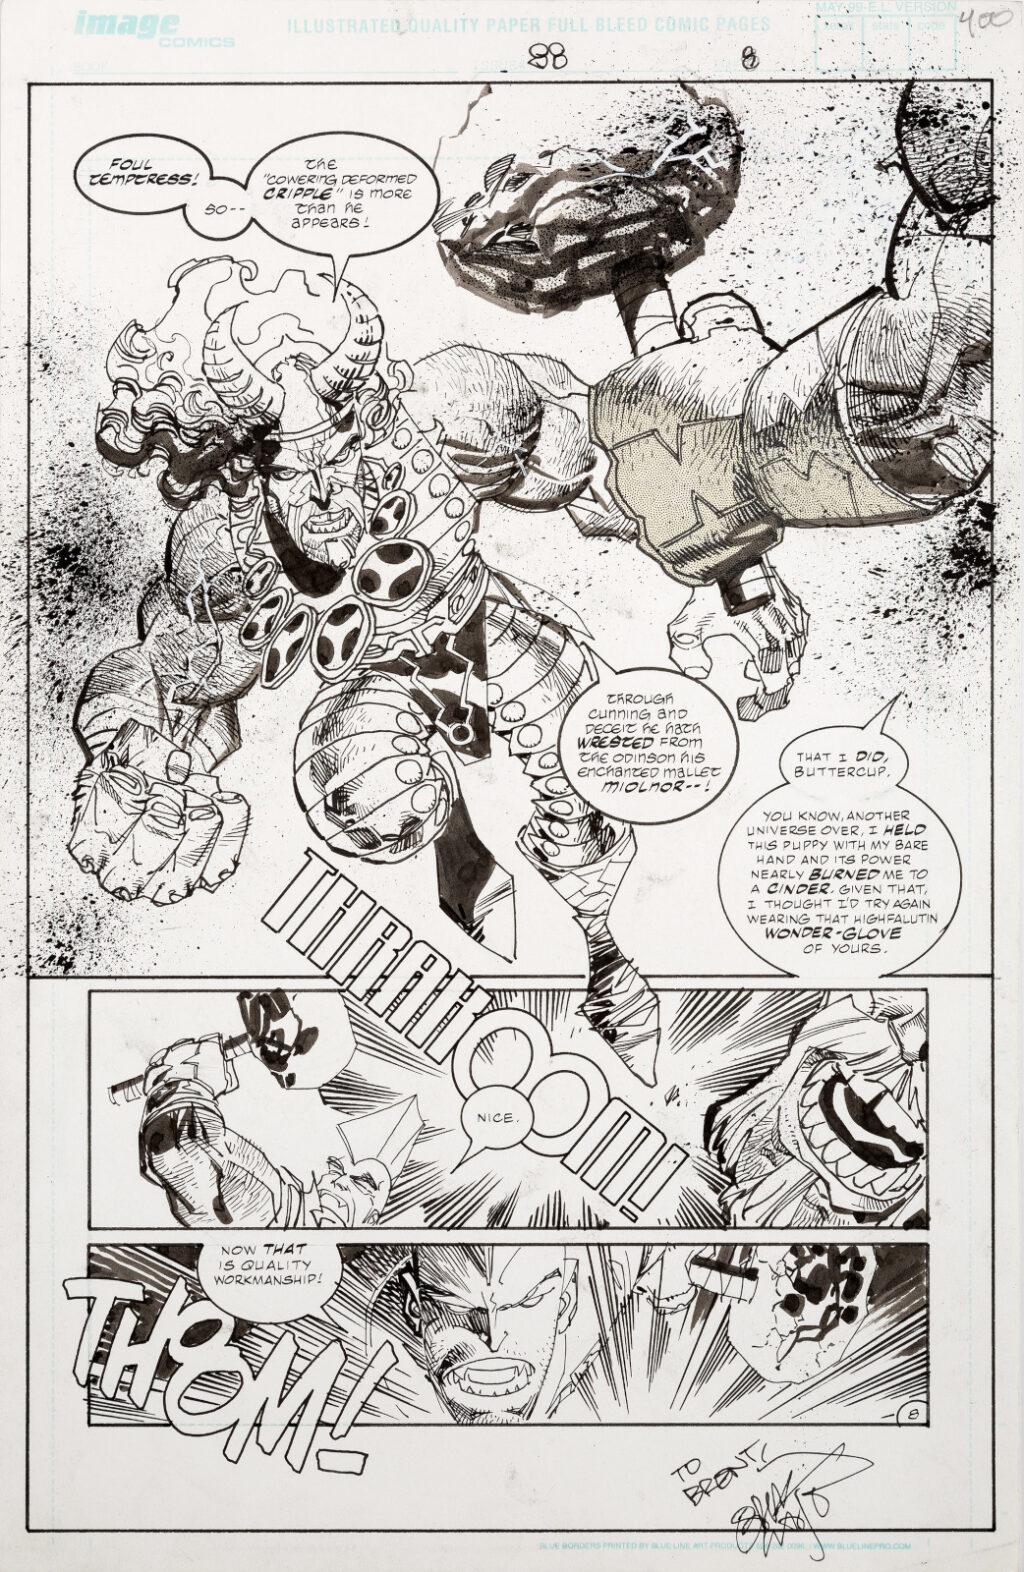 Savage Dragon issue 88 page 8 by Erik Larson